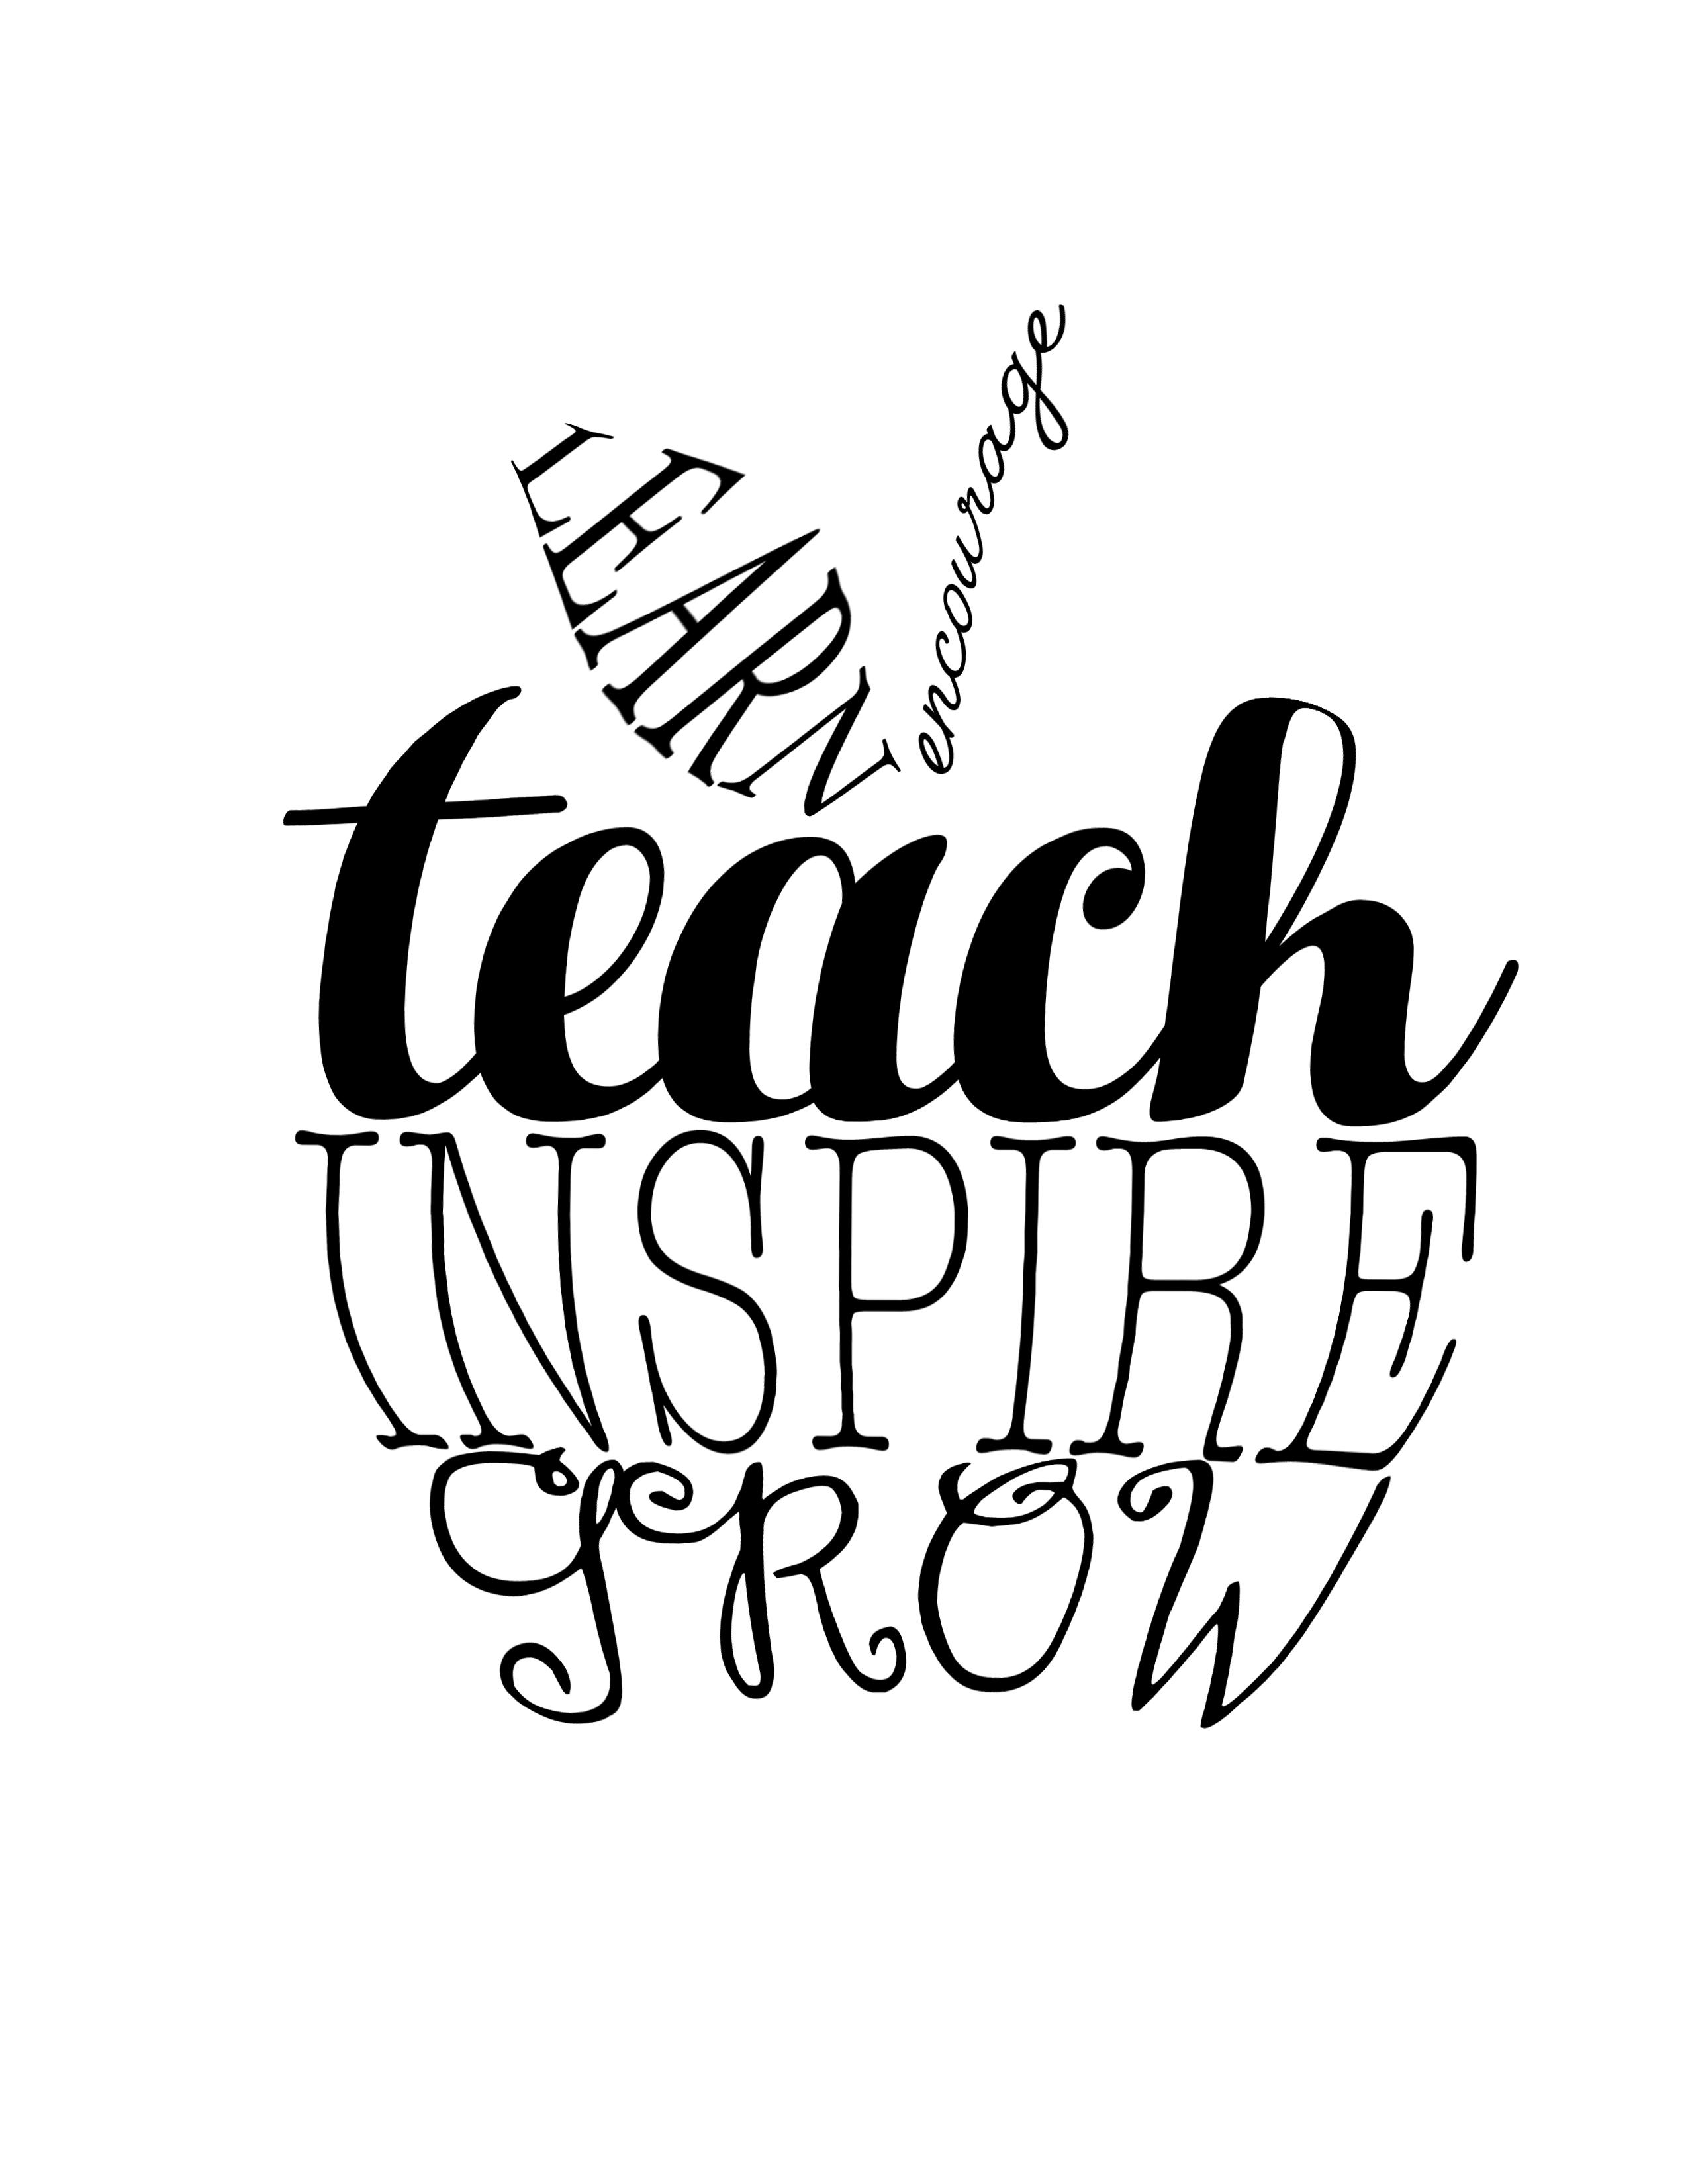 Free Download-Teacher Appreciation Apple » Amanda Brayton